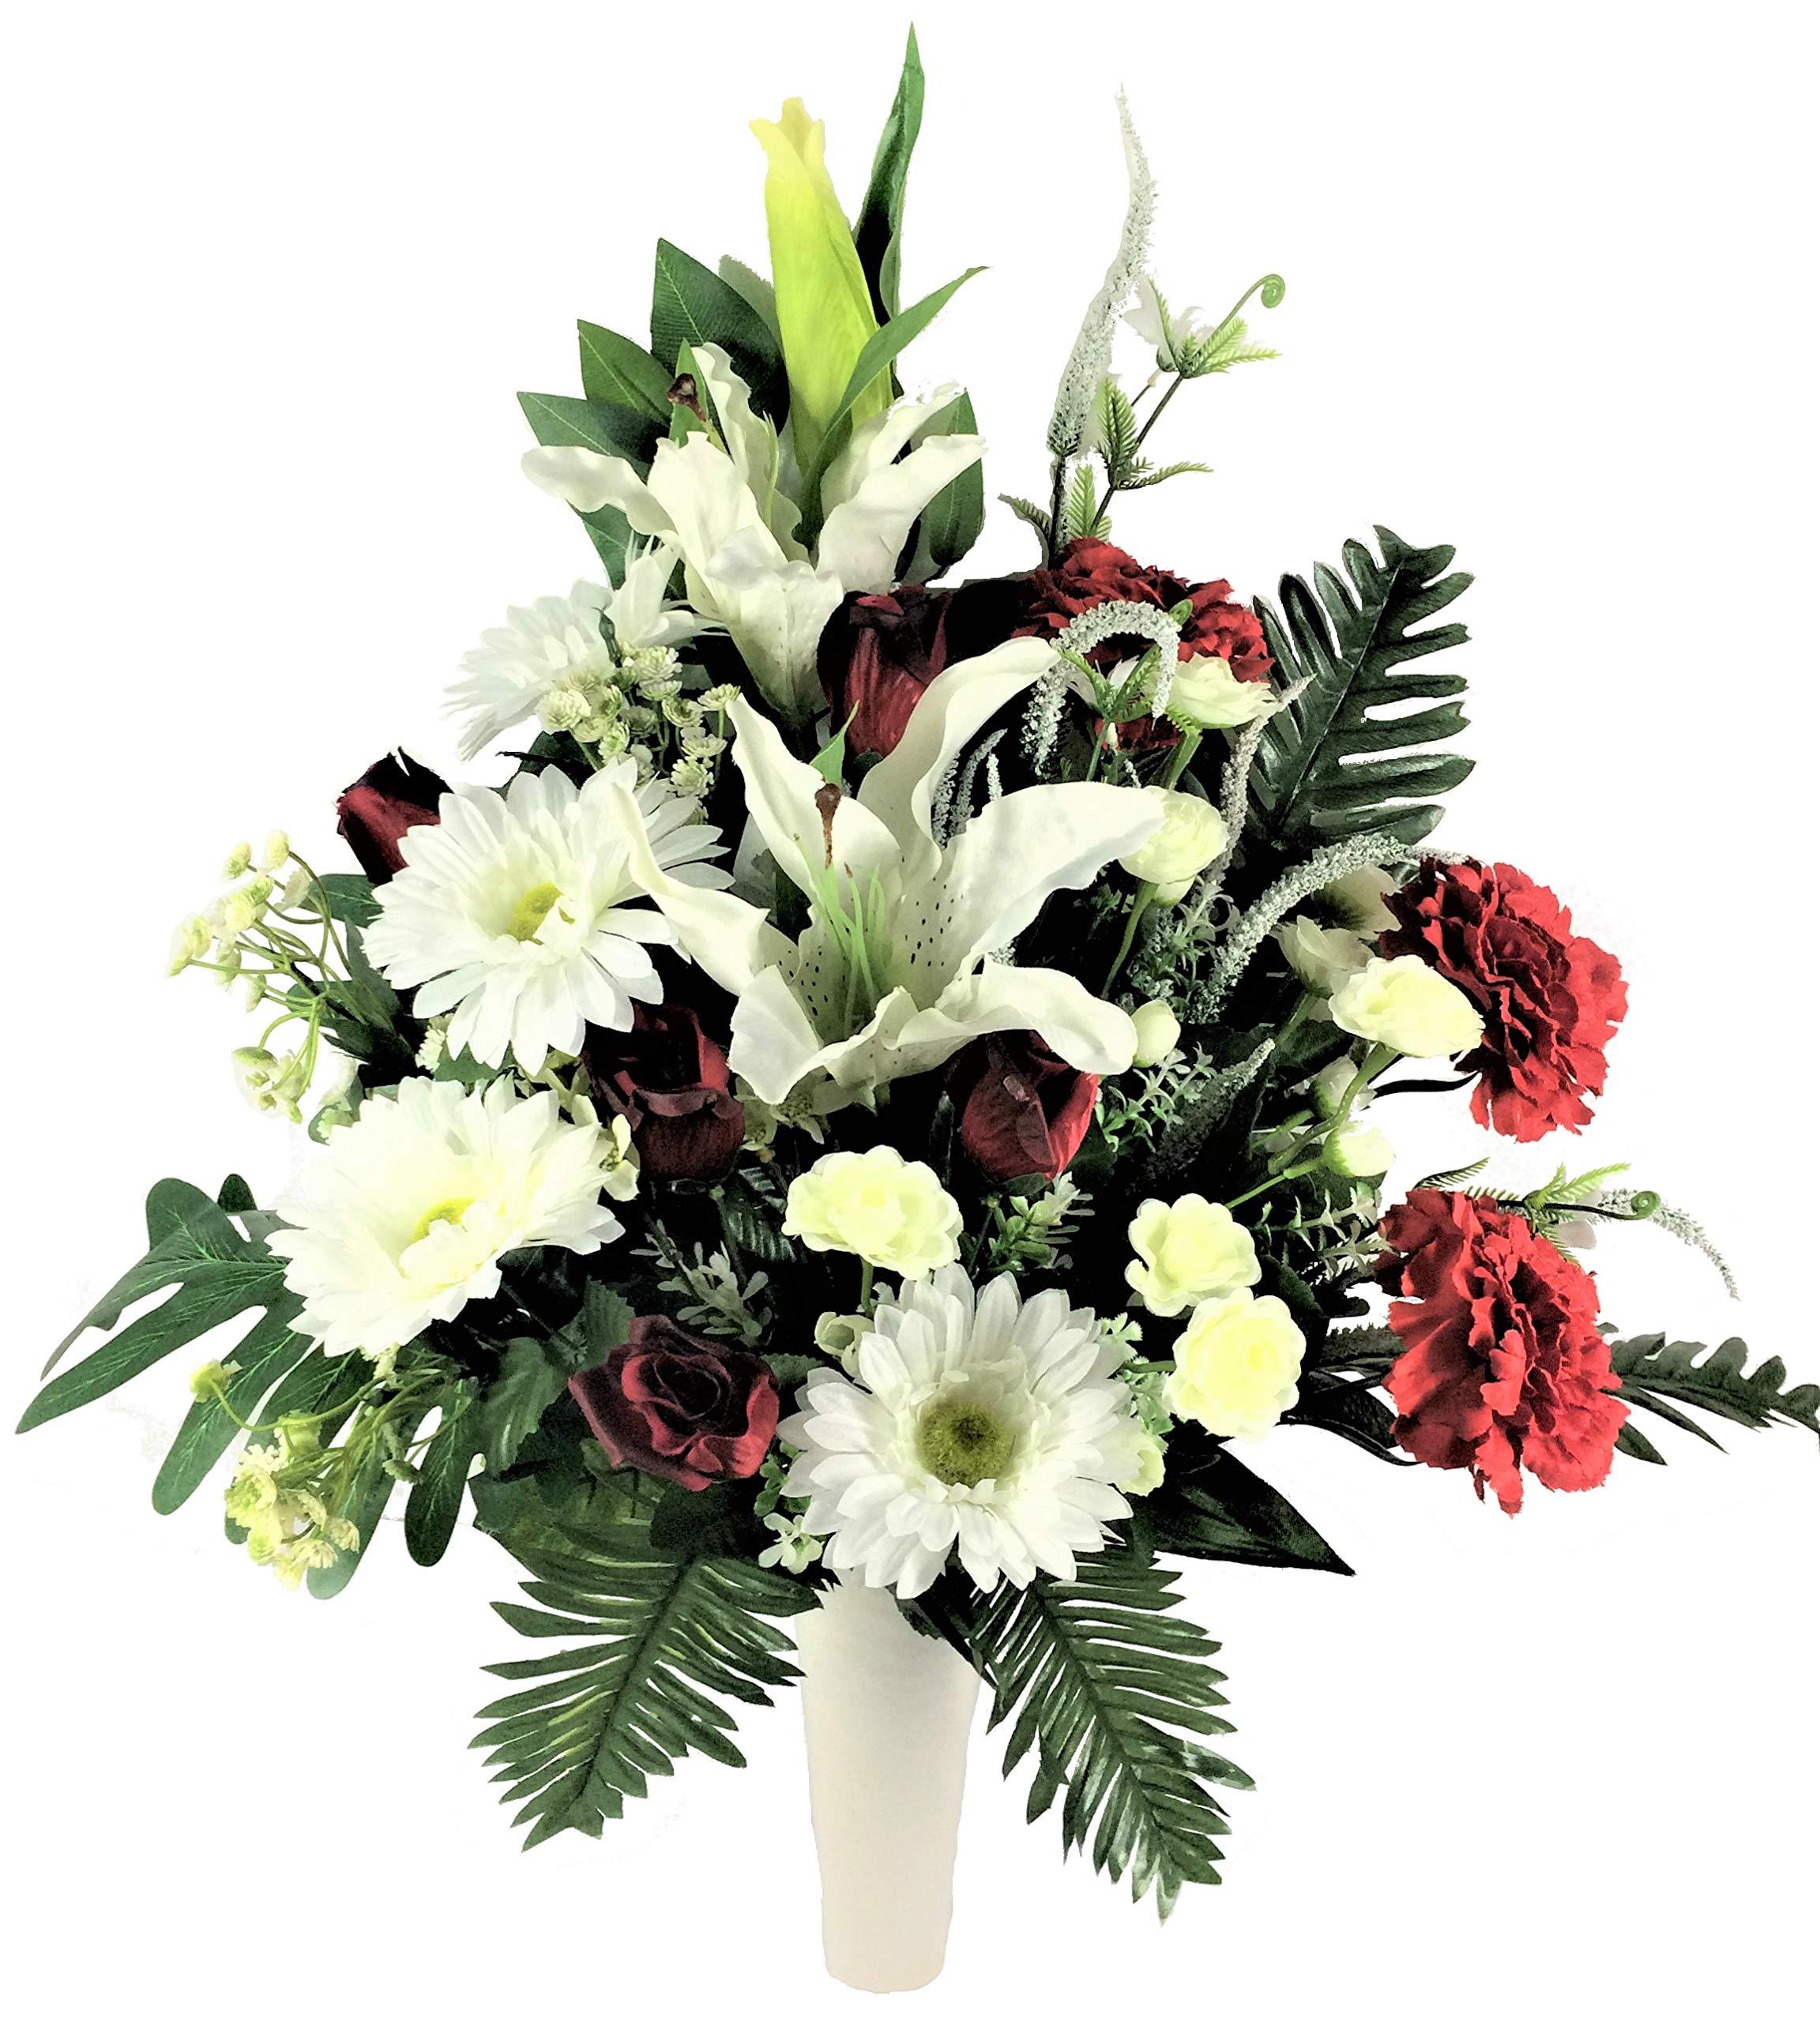 LBA Centro de Flores Artificiales para Cementerio, Preparado para Introducir en los Botes de Tumbas o Nichos. Varios…